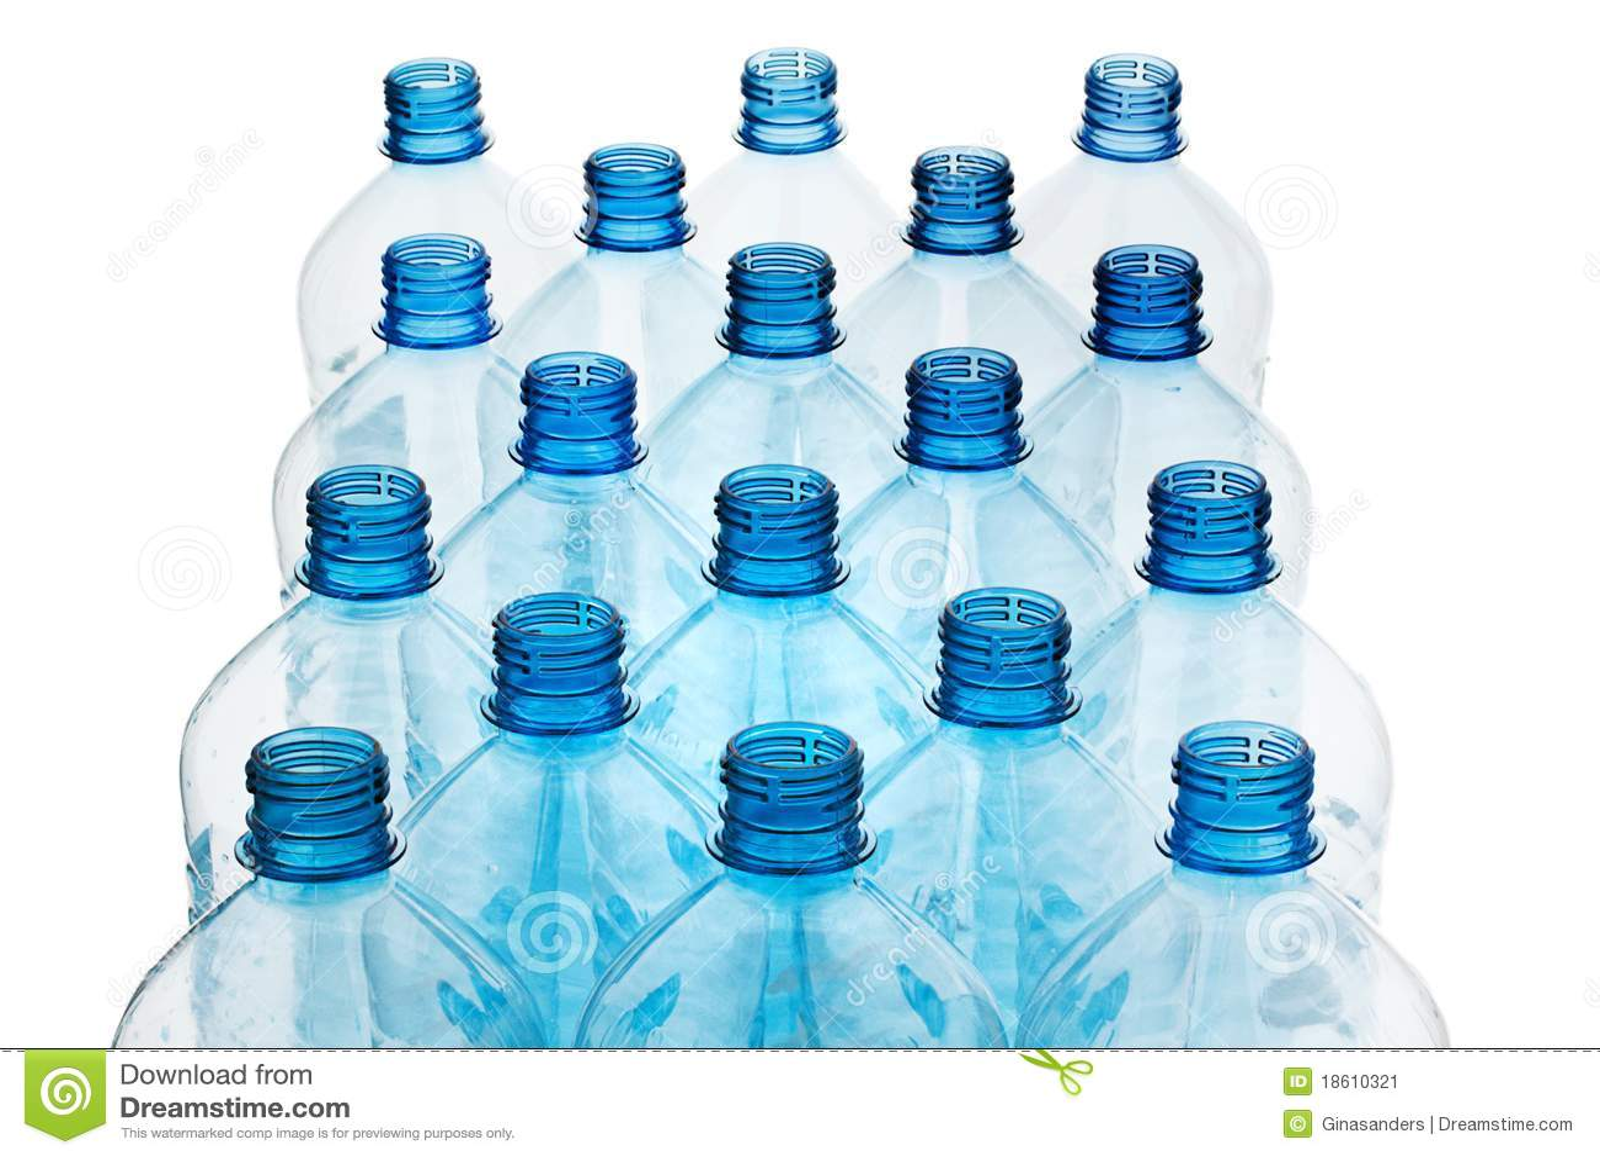 Vendita bottiglie pet all ingrosso Comprare bottiglie pet SoloStocks